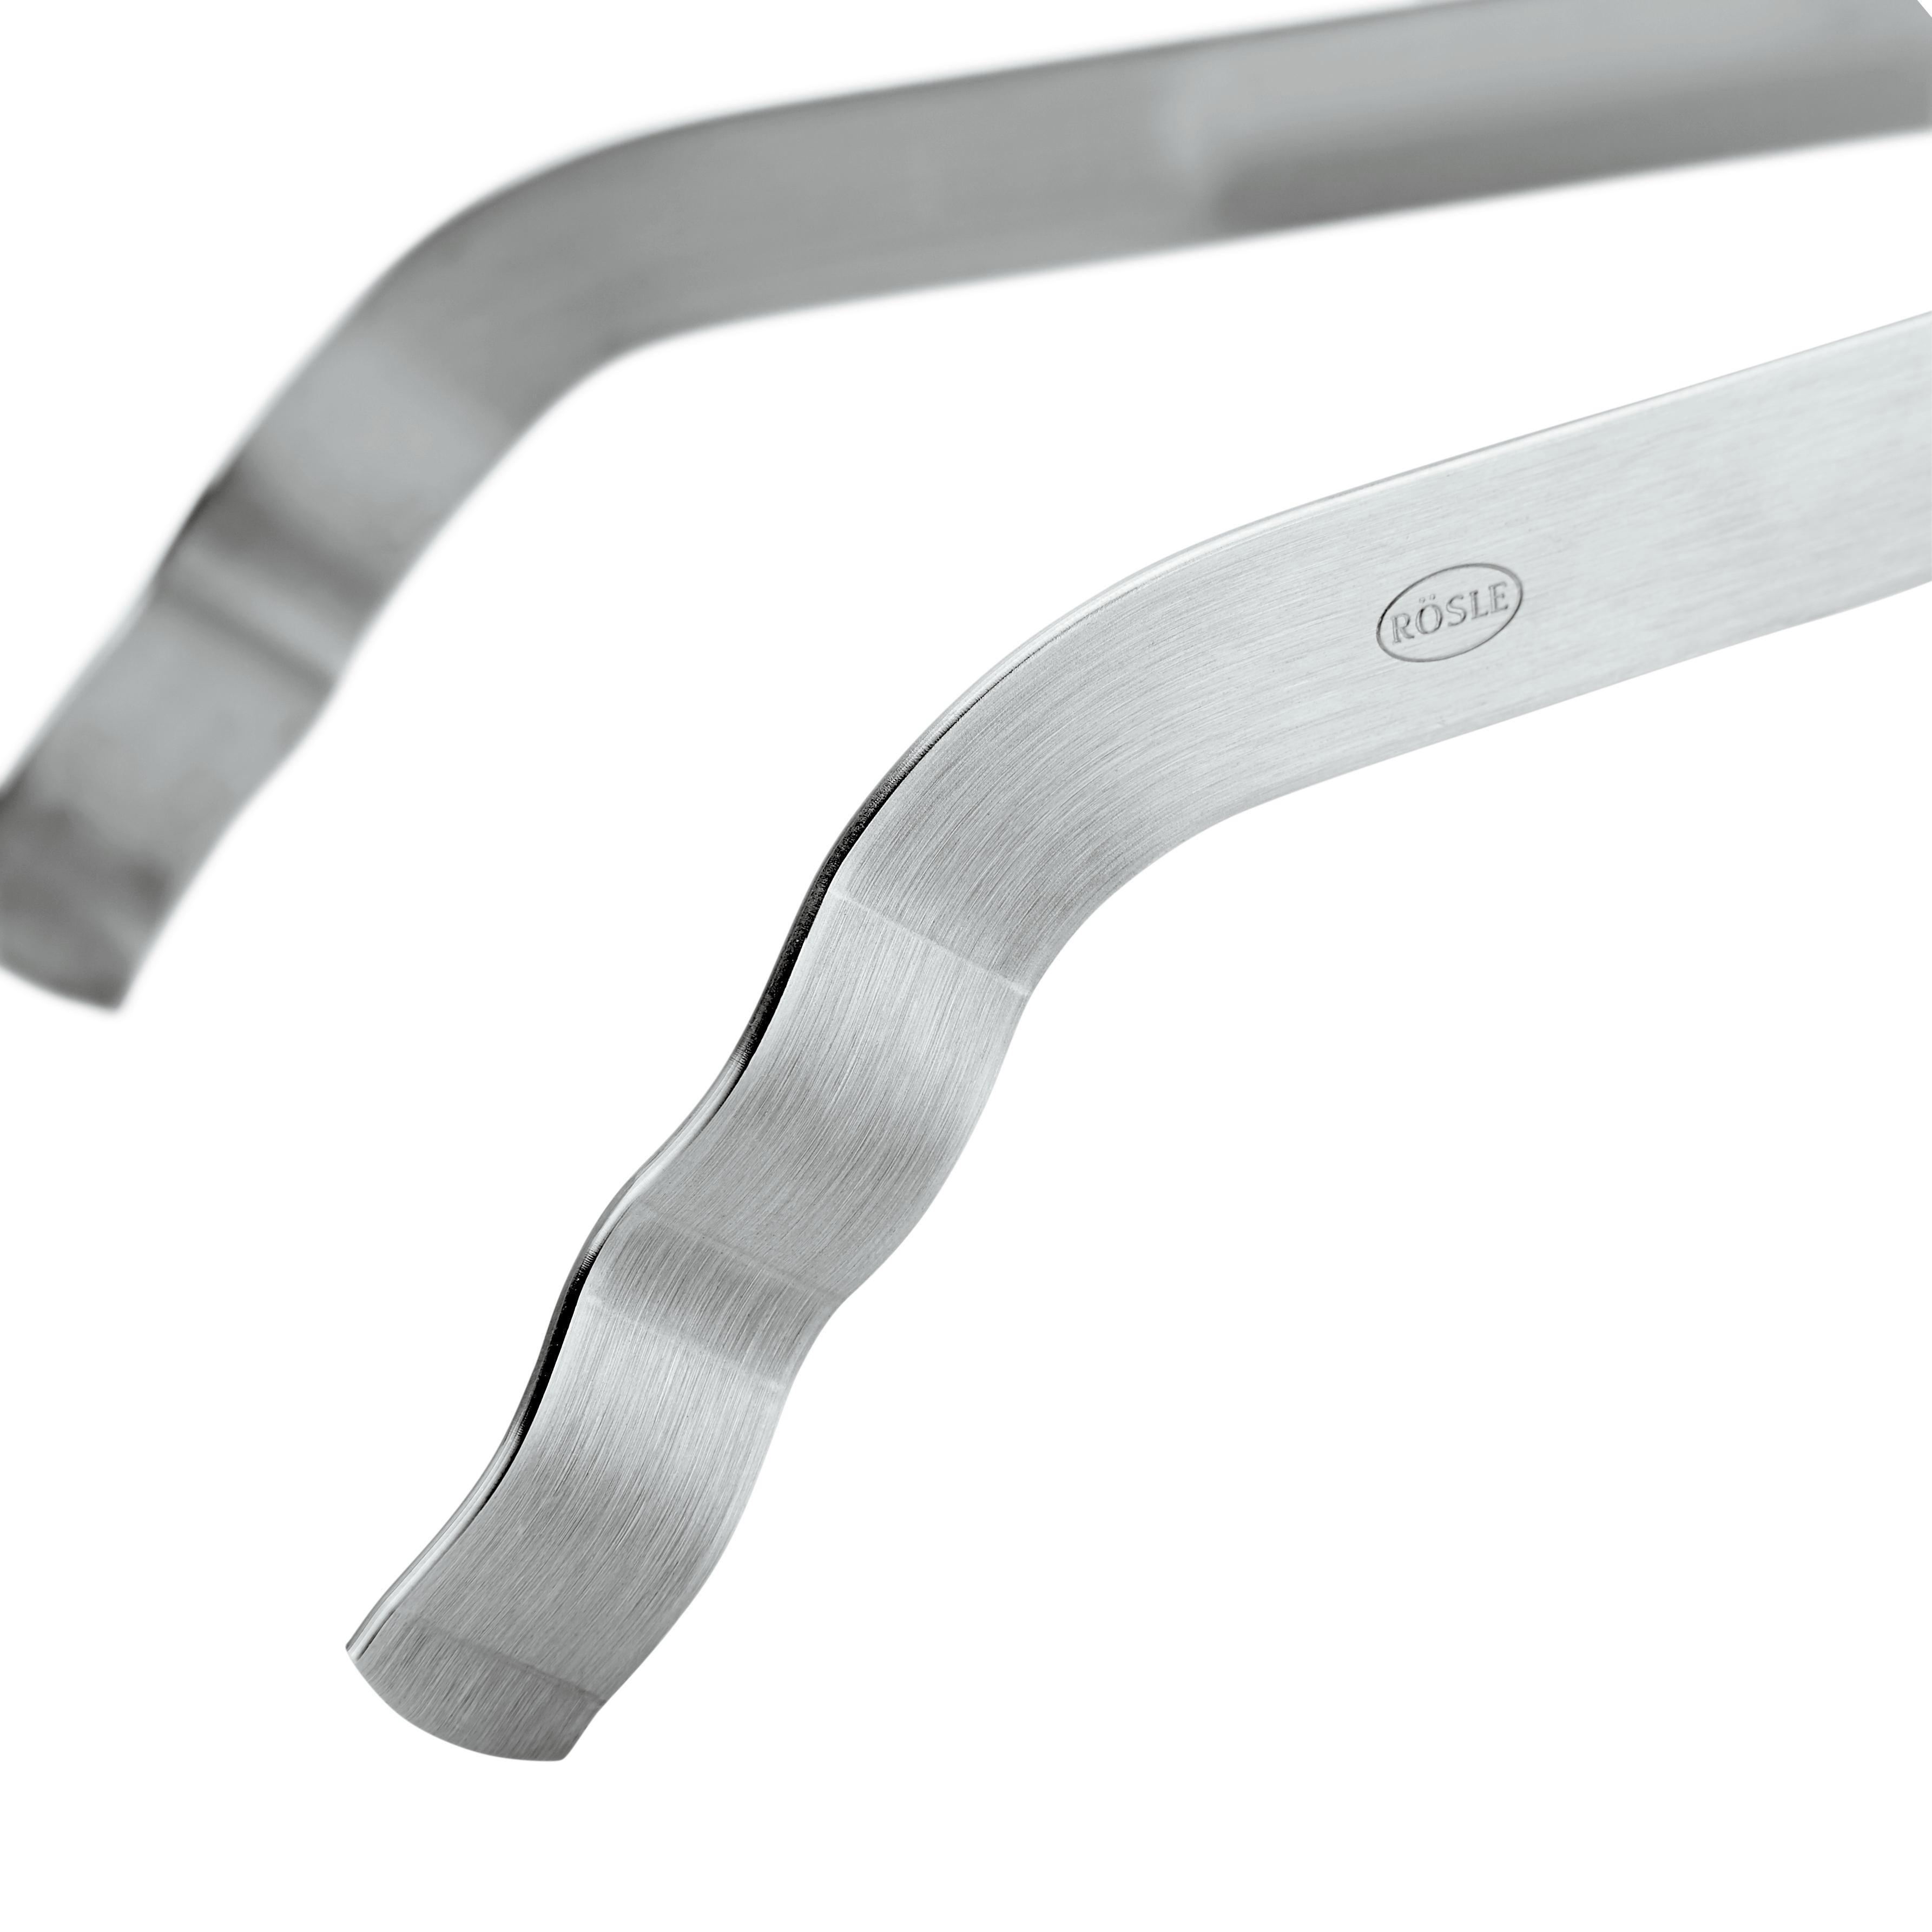 Grillzange Rösle - Edelstahlfarben, KONVENTIONELL, Metall (35,5/5/8cm) - RÖSLE